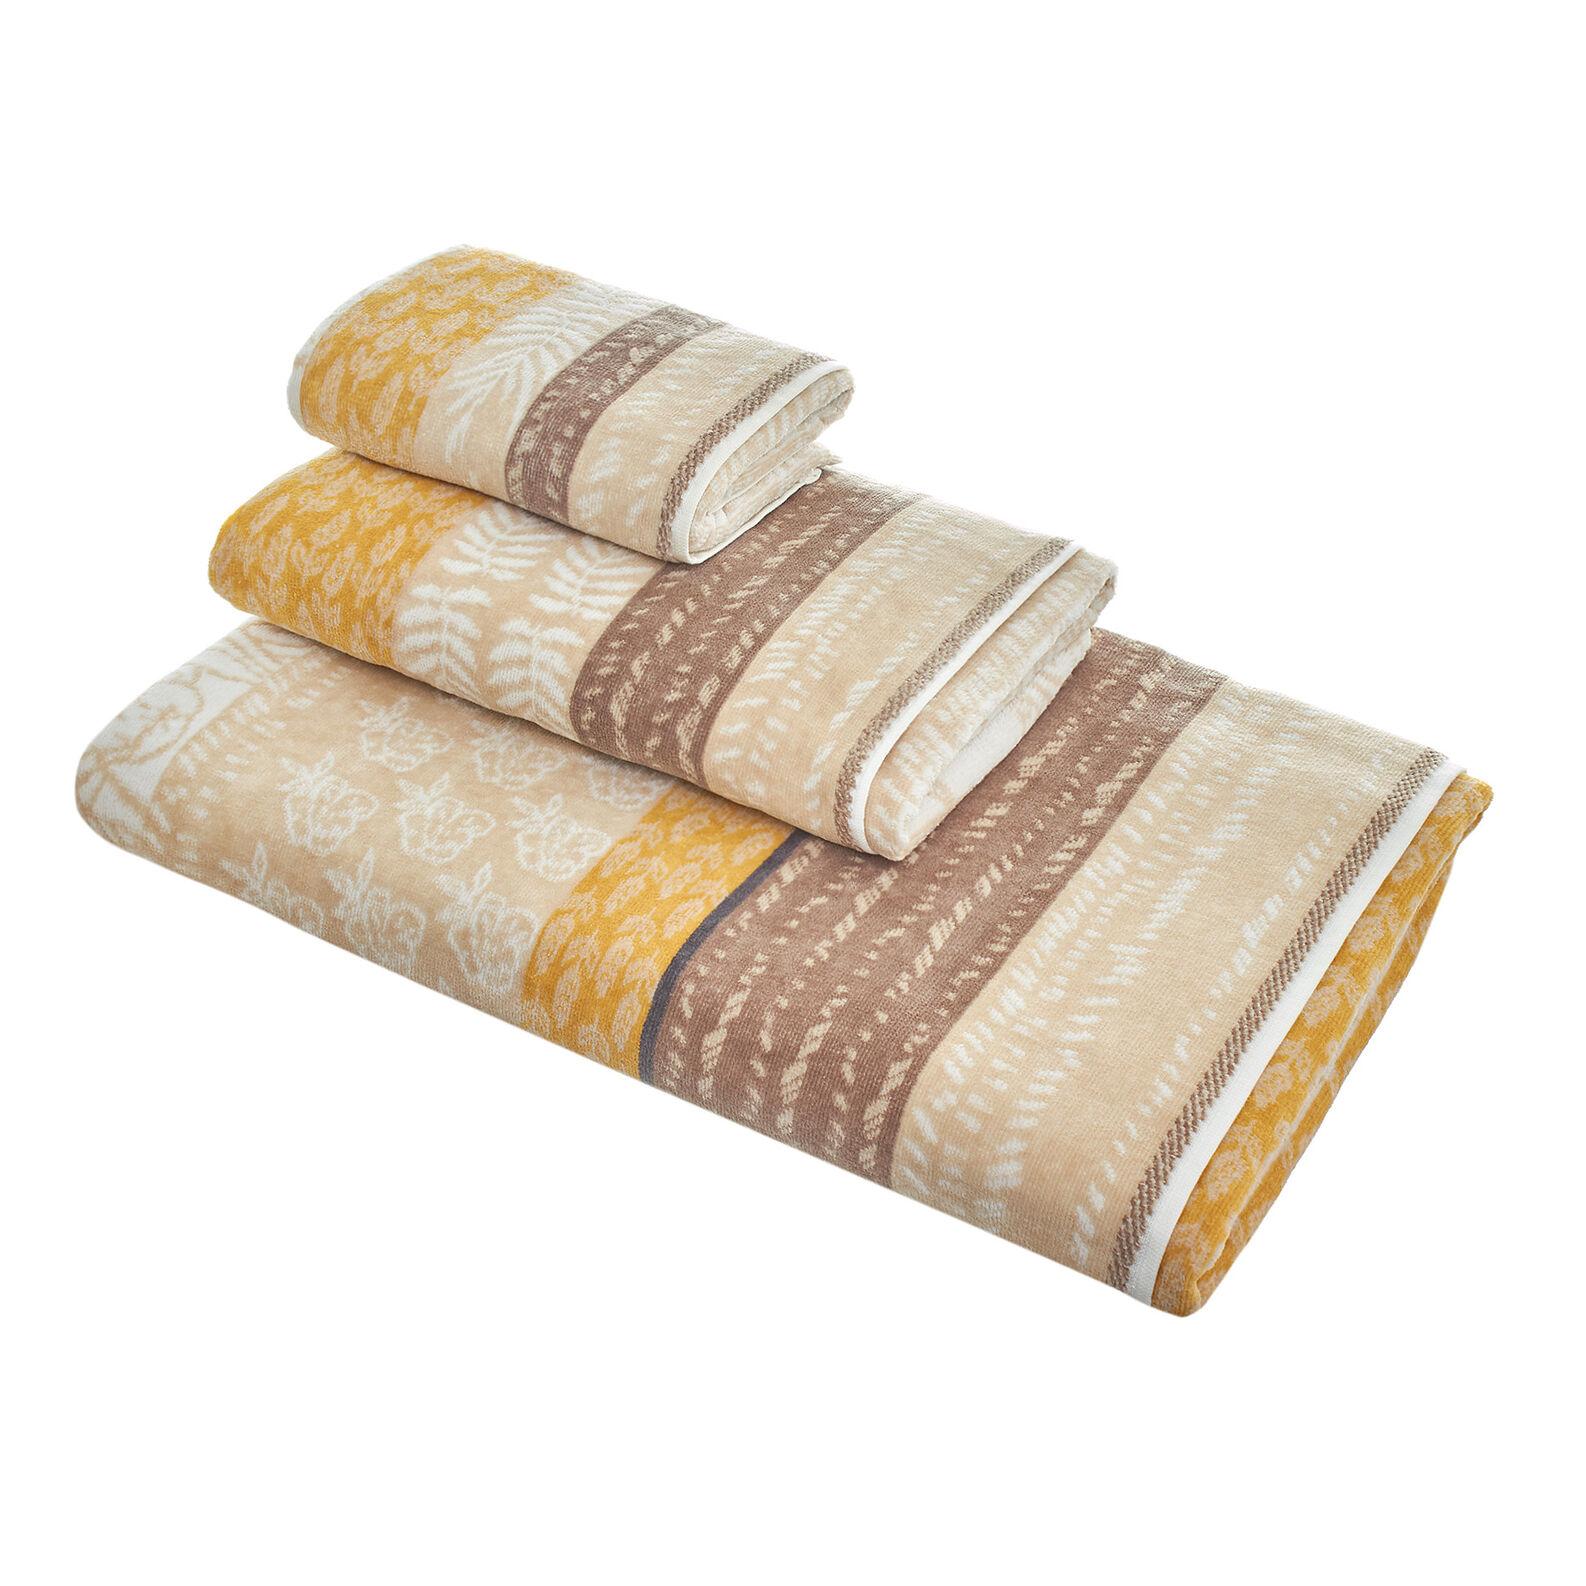 Asciugamano velour puro cotone righe patchwork